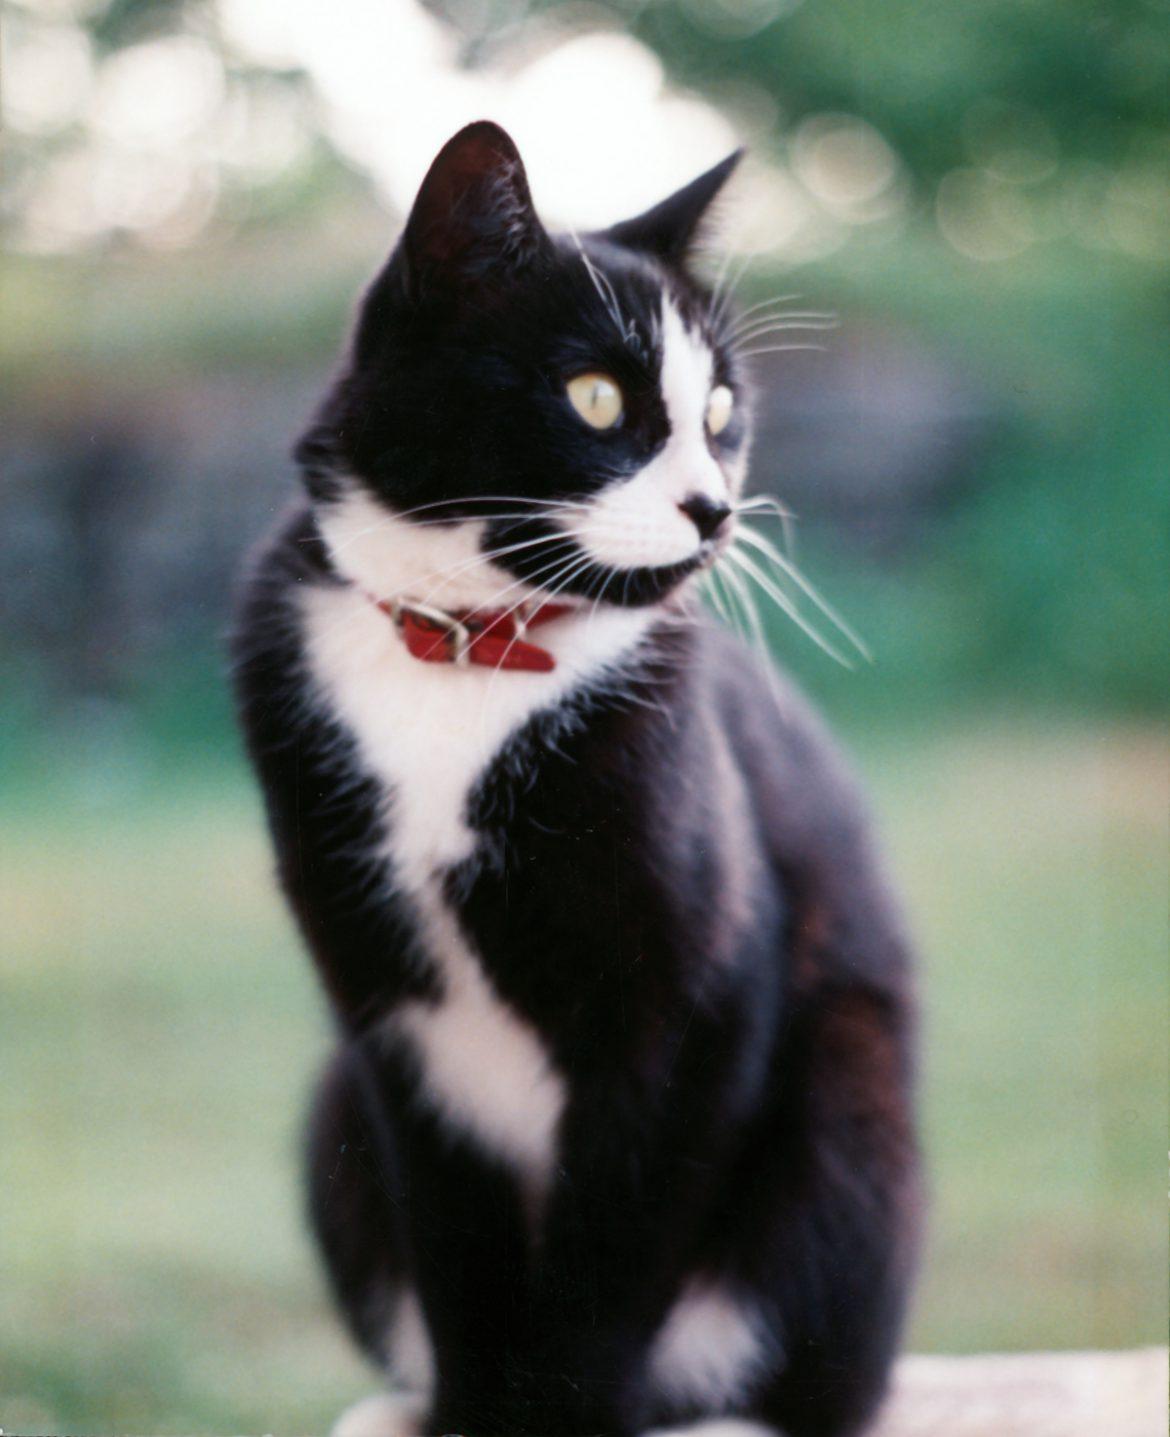 Juno - a companion animal